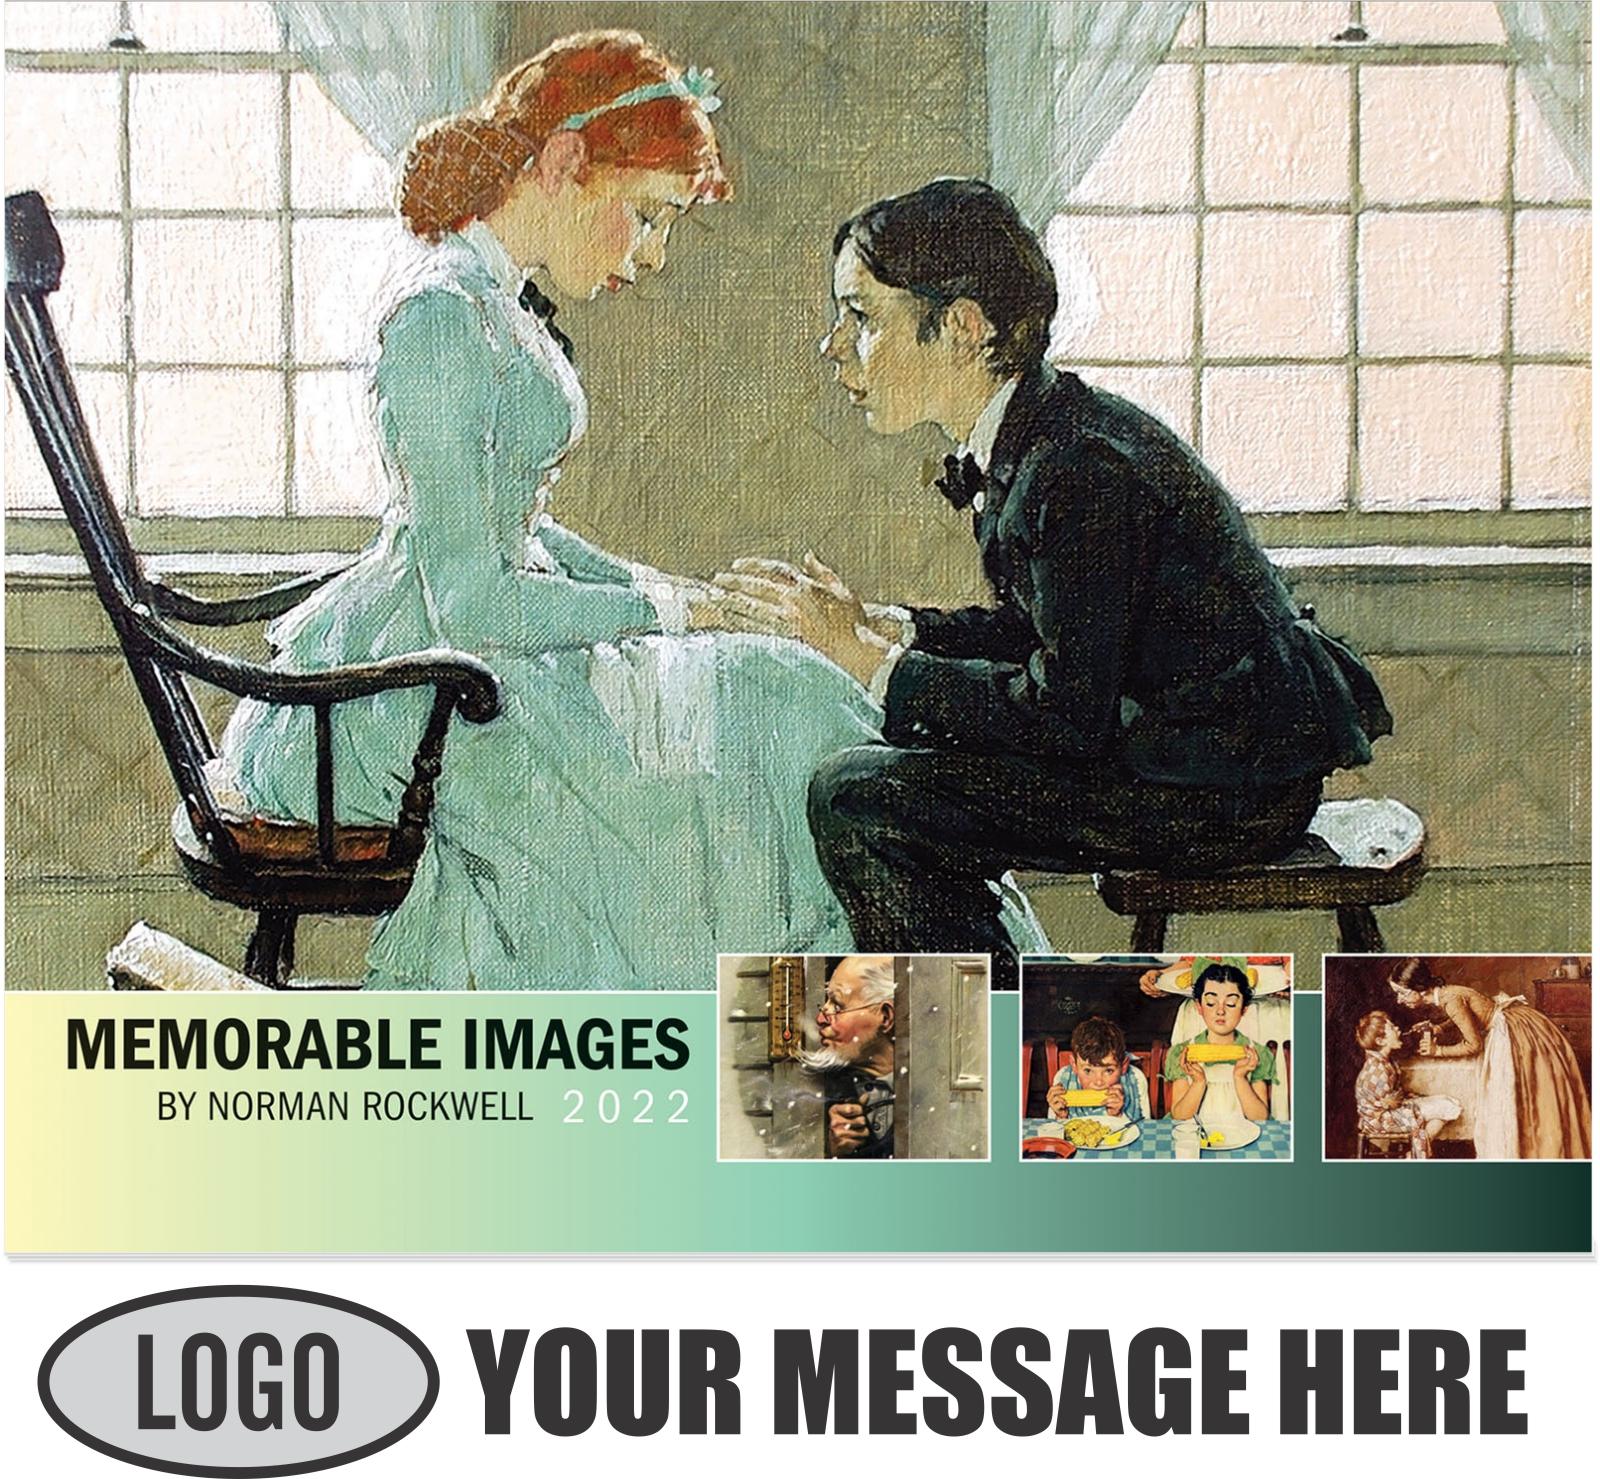 2022 Norman Rockwell - Memorable Images Promotional Calendar